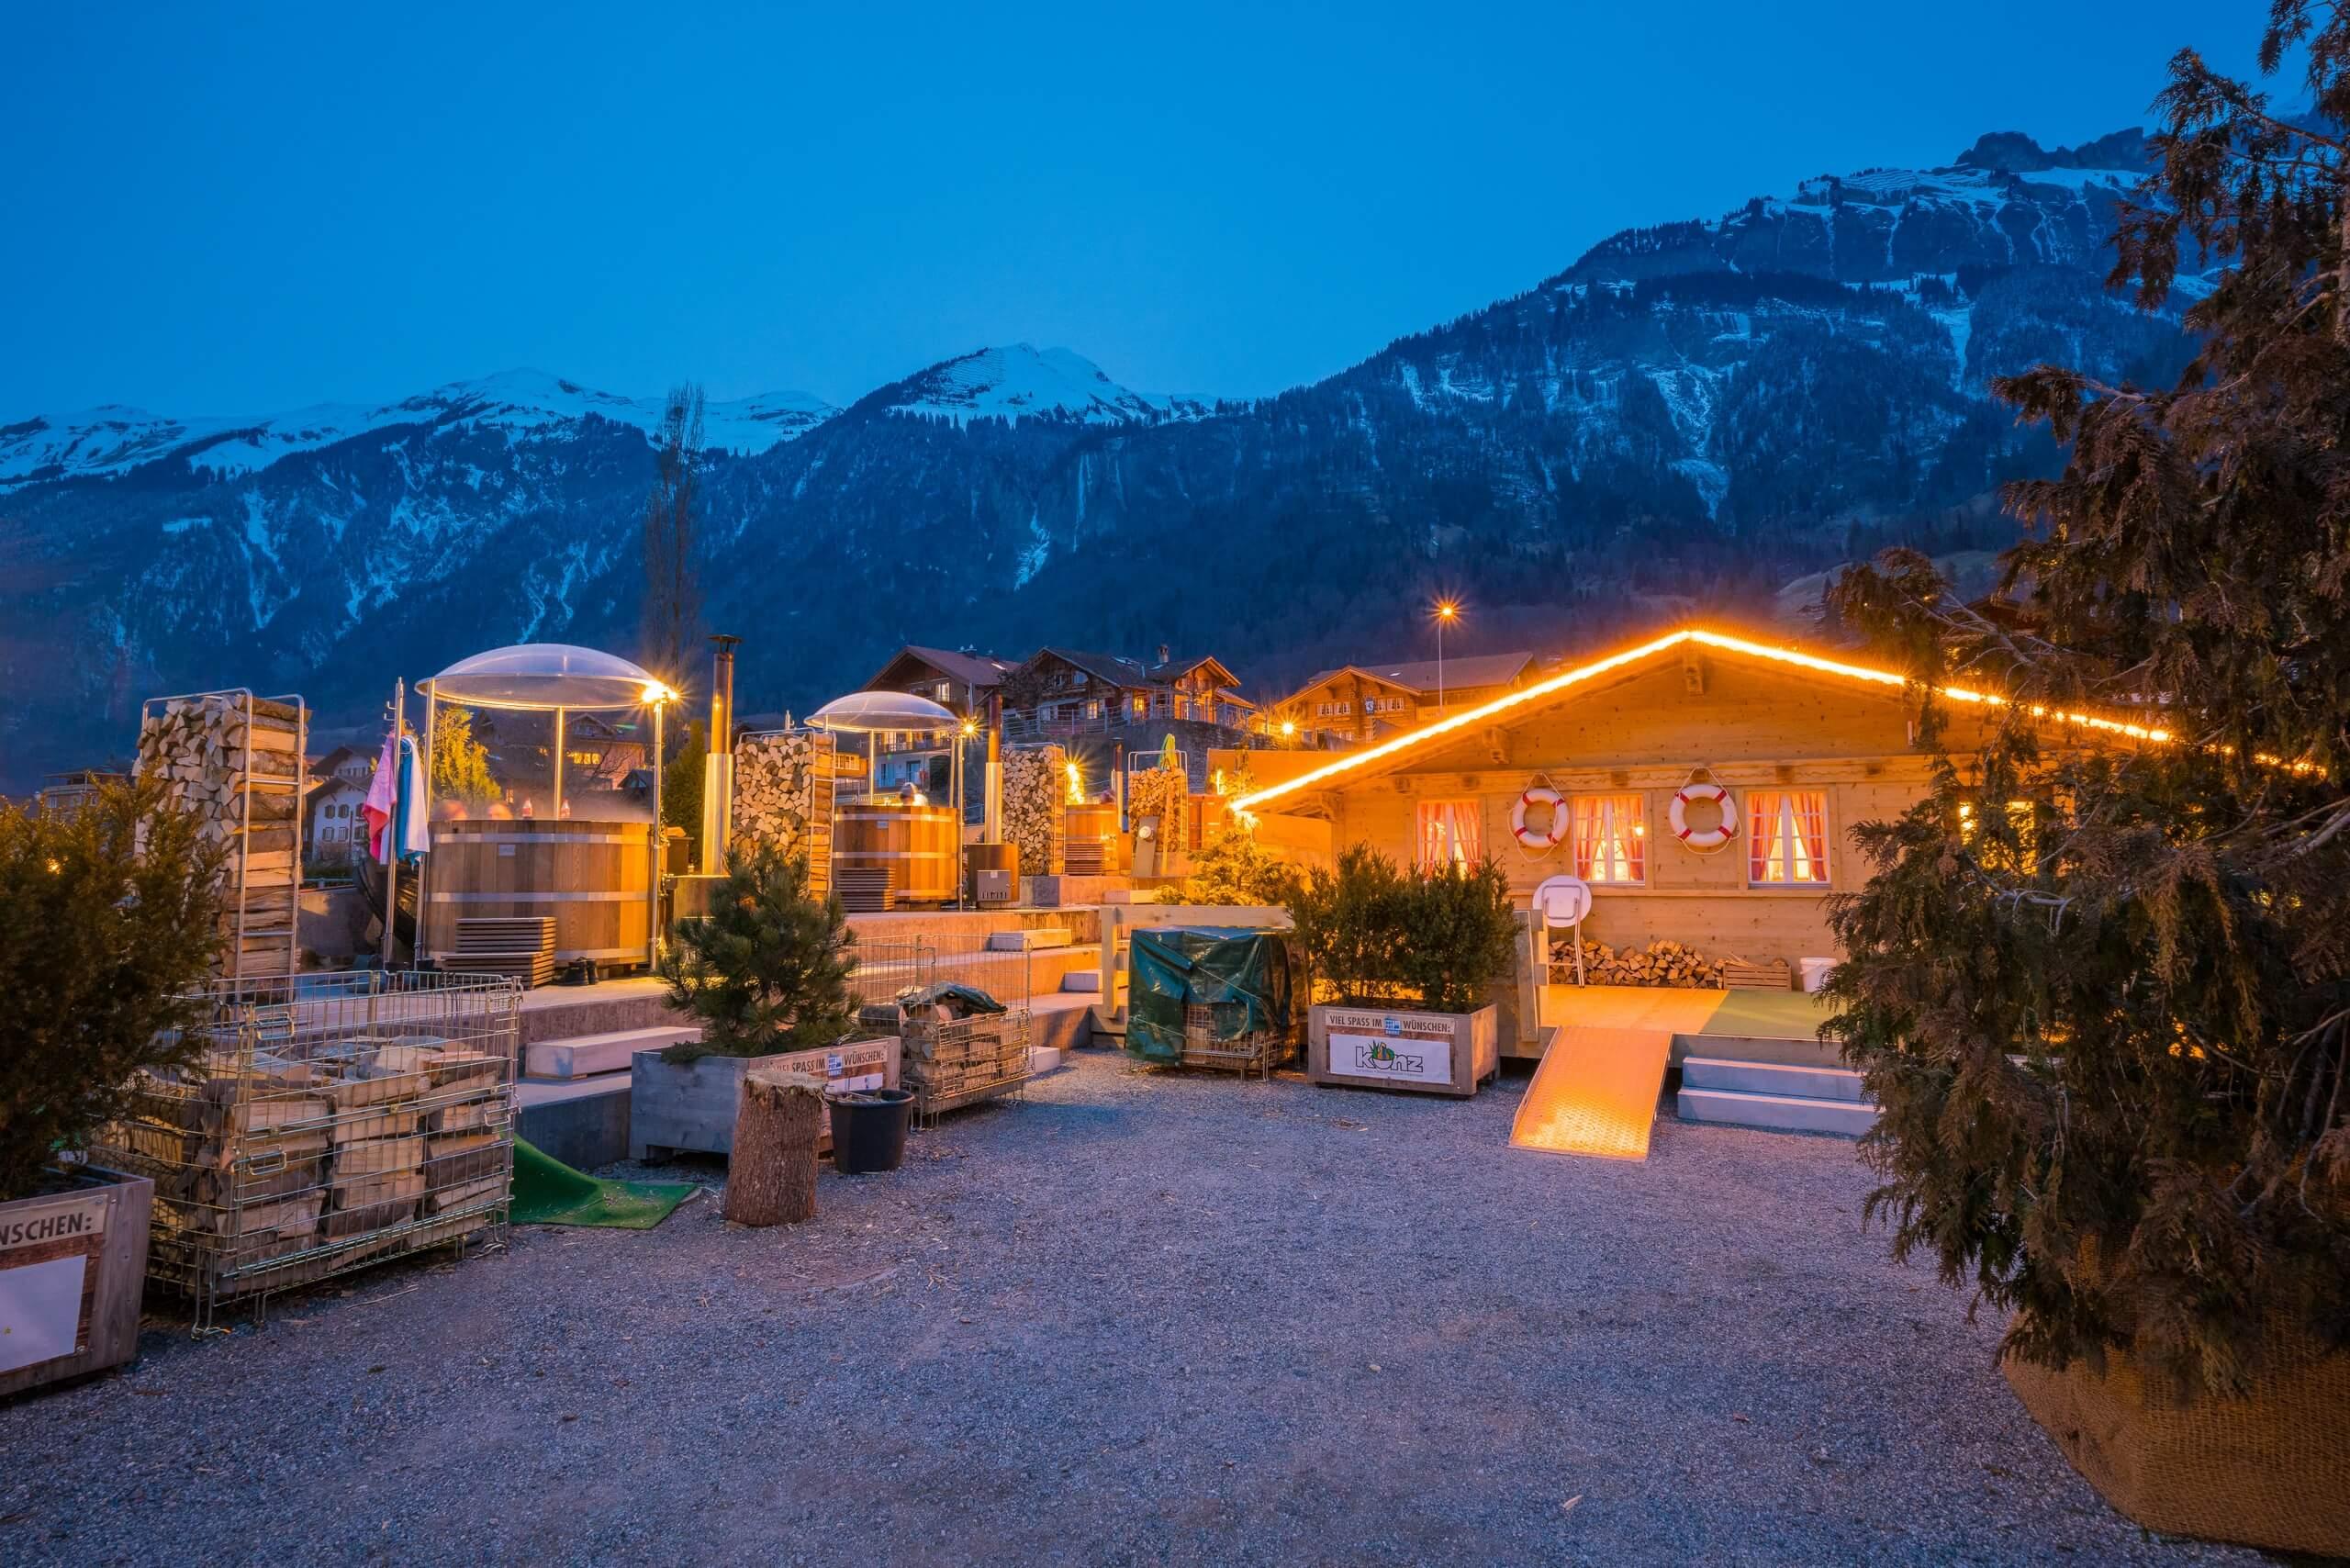 brienz-hot-pot-winter-beleuchtung-abendstimmung